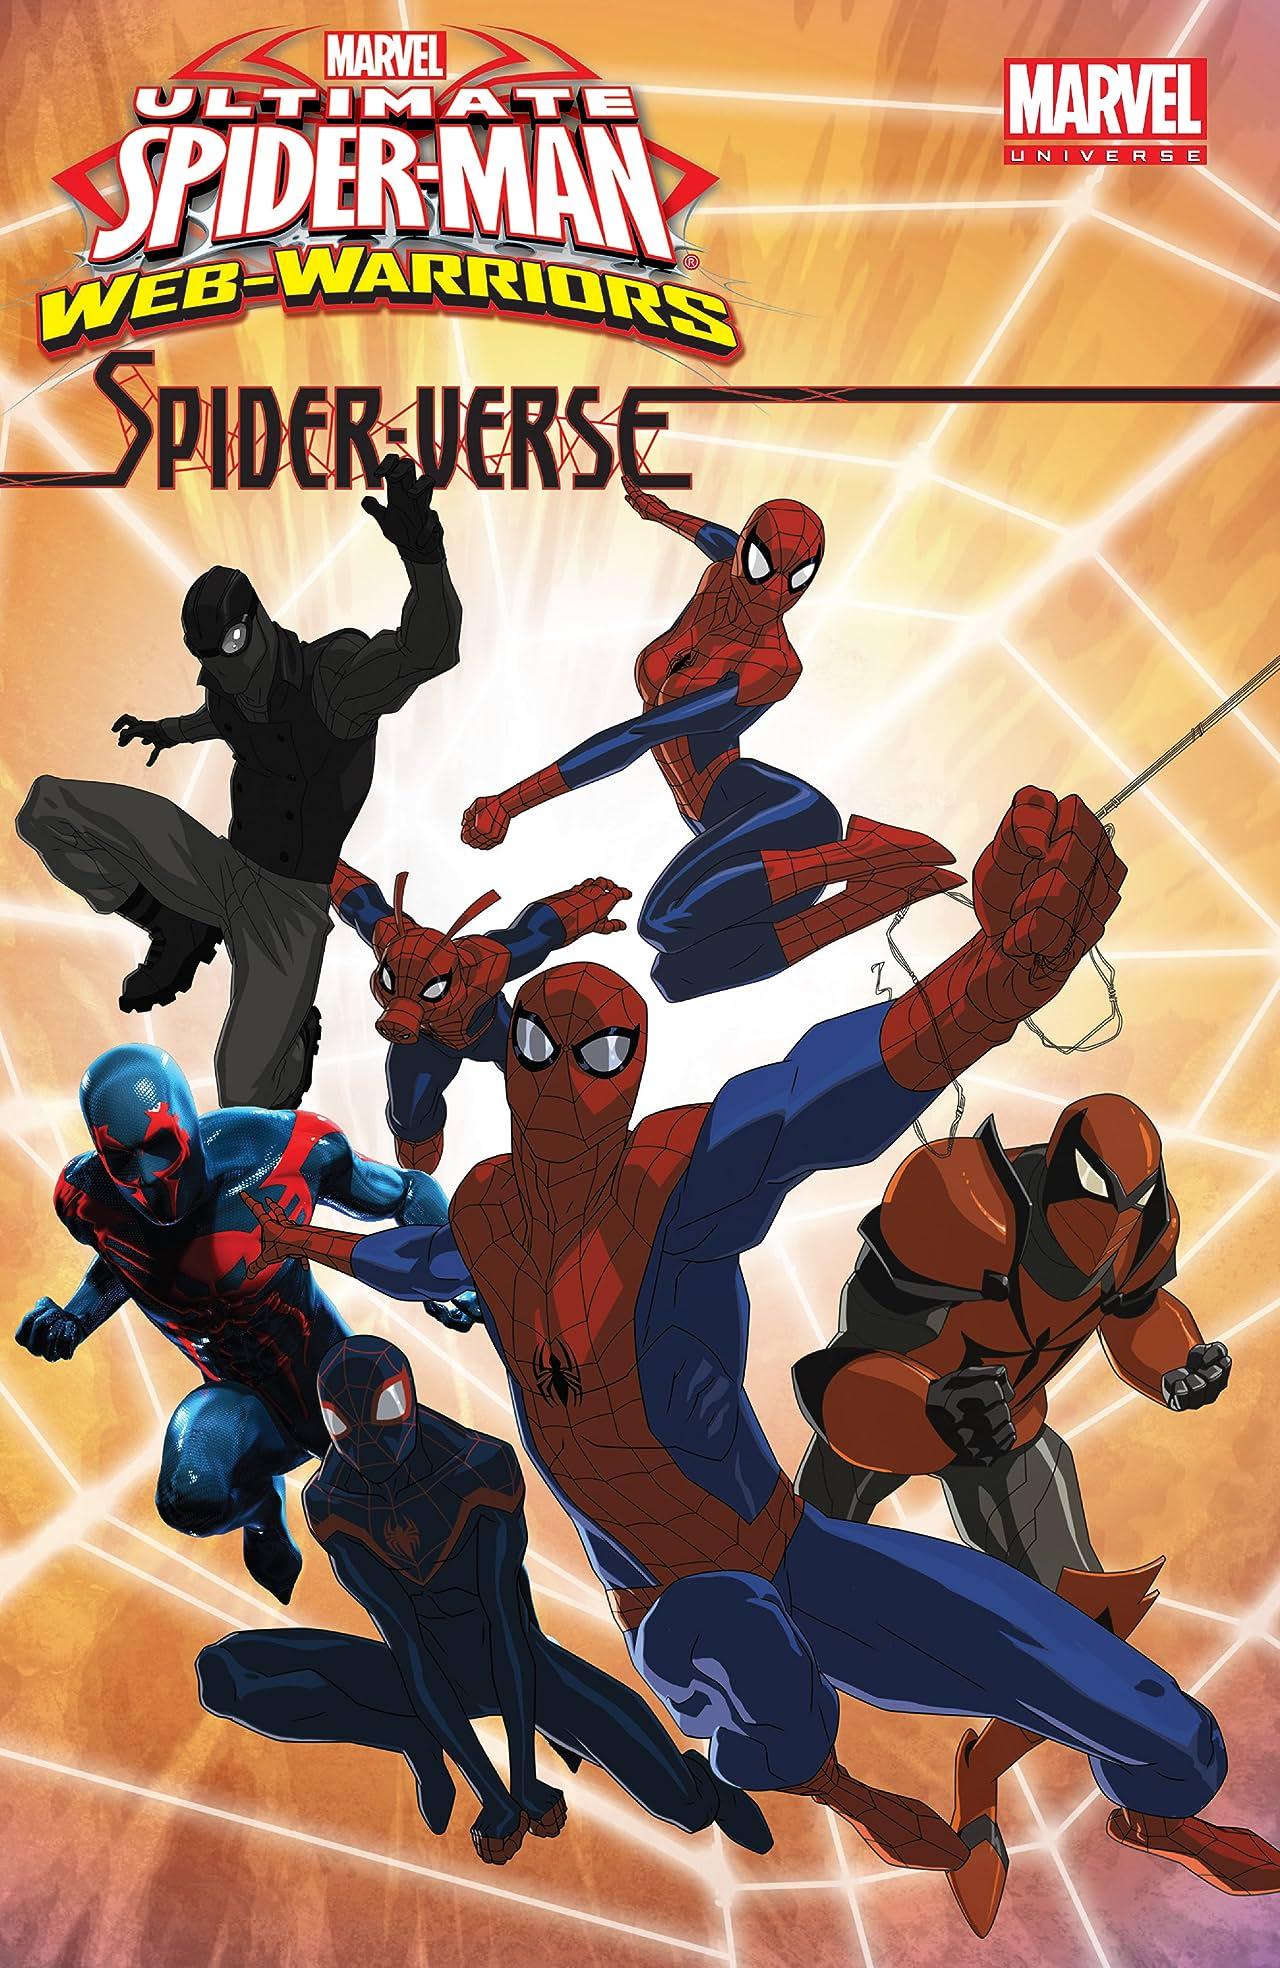 Marvel Universe Ultimate Spider-Man: Spider-Verse